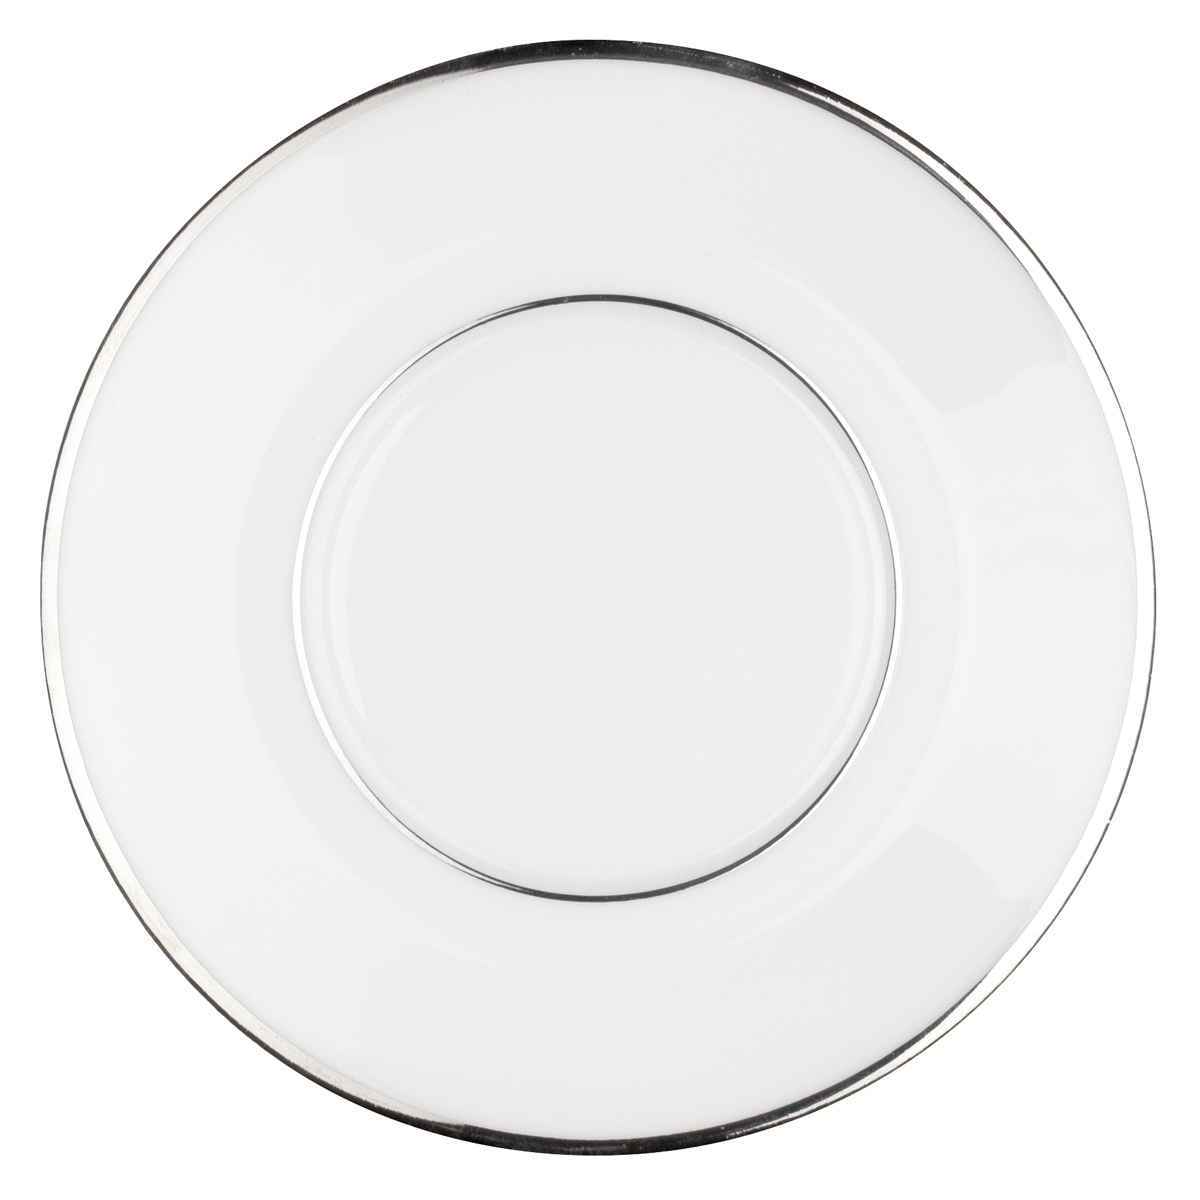 galon platine tasse a dejeuner 40 cl les tasses la table parisienne. Black Bedroom Furniture Sets. Home Design Ideas